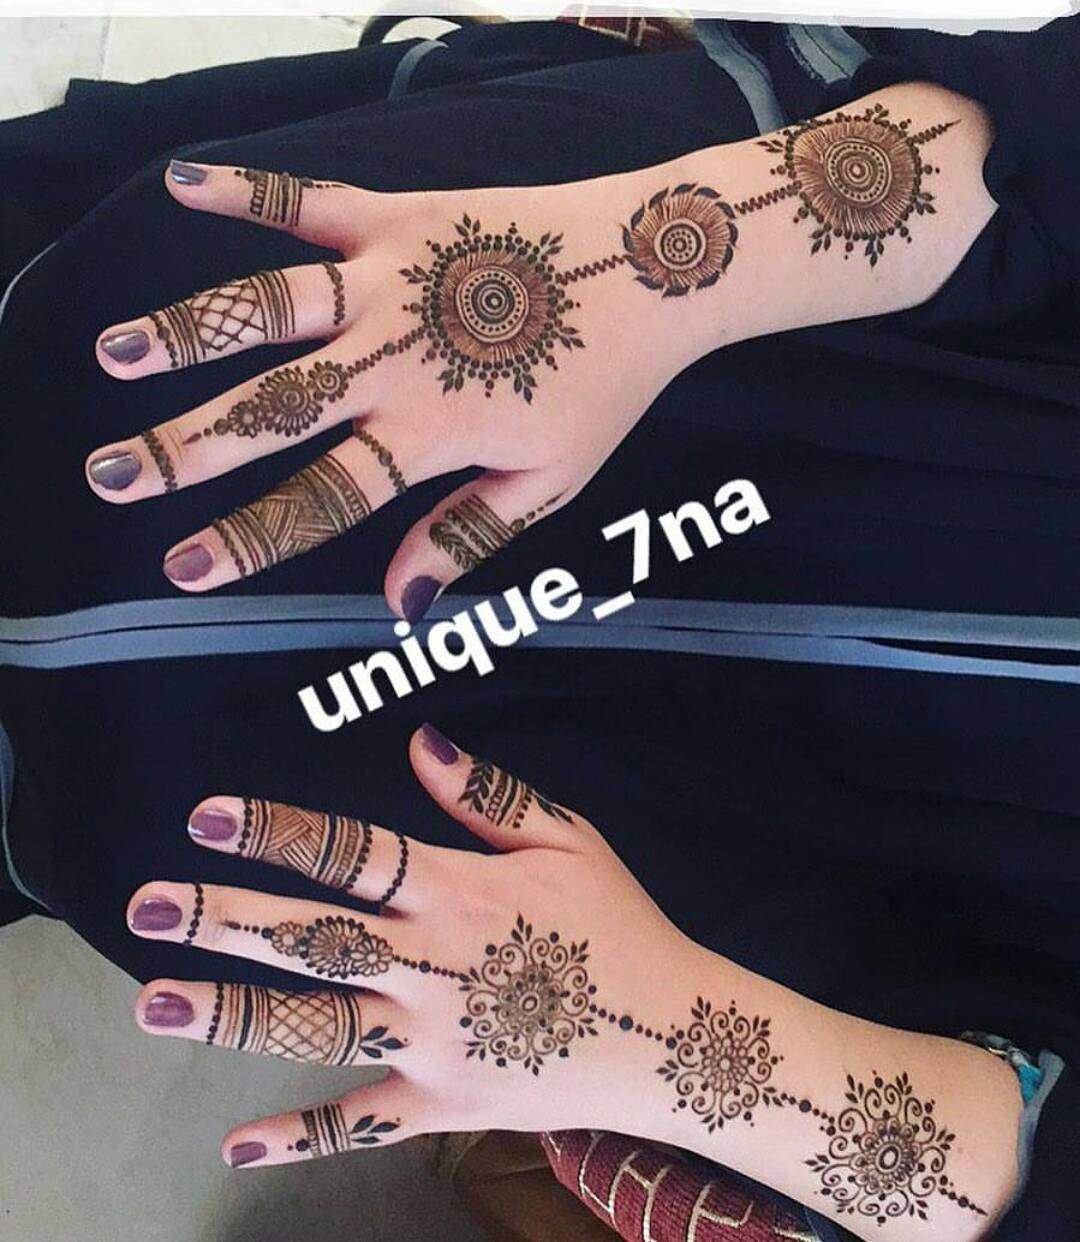 Unique 7na Abaya Show Abaya Show حناء حنايات الحناء رسم نقش فن موضه ديزاين الامارات ابوظبي مشاركه دبي تصويري Hand Henna Henna Designs Henna Hand Tattoo